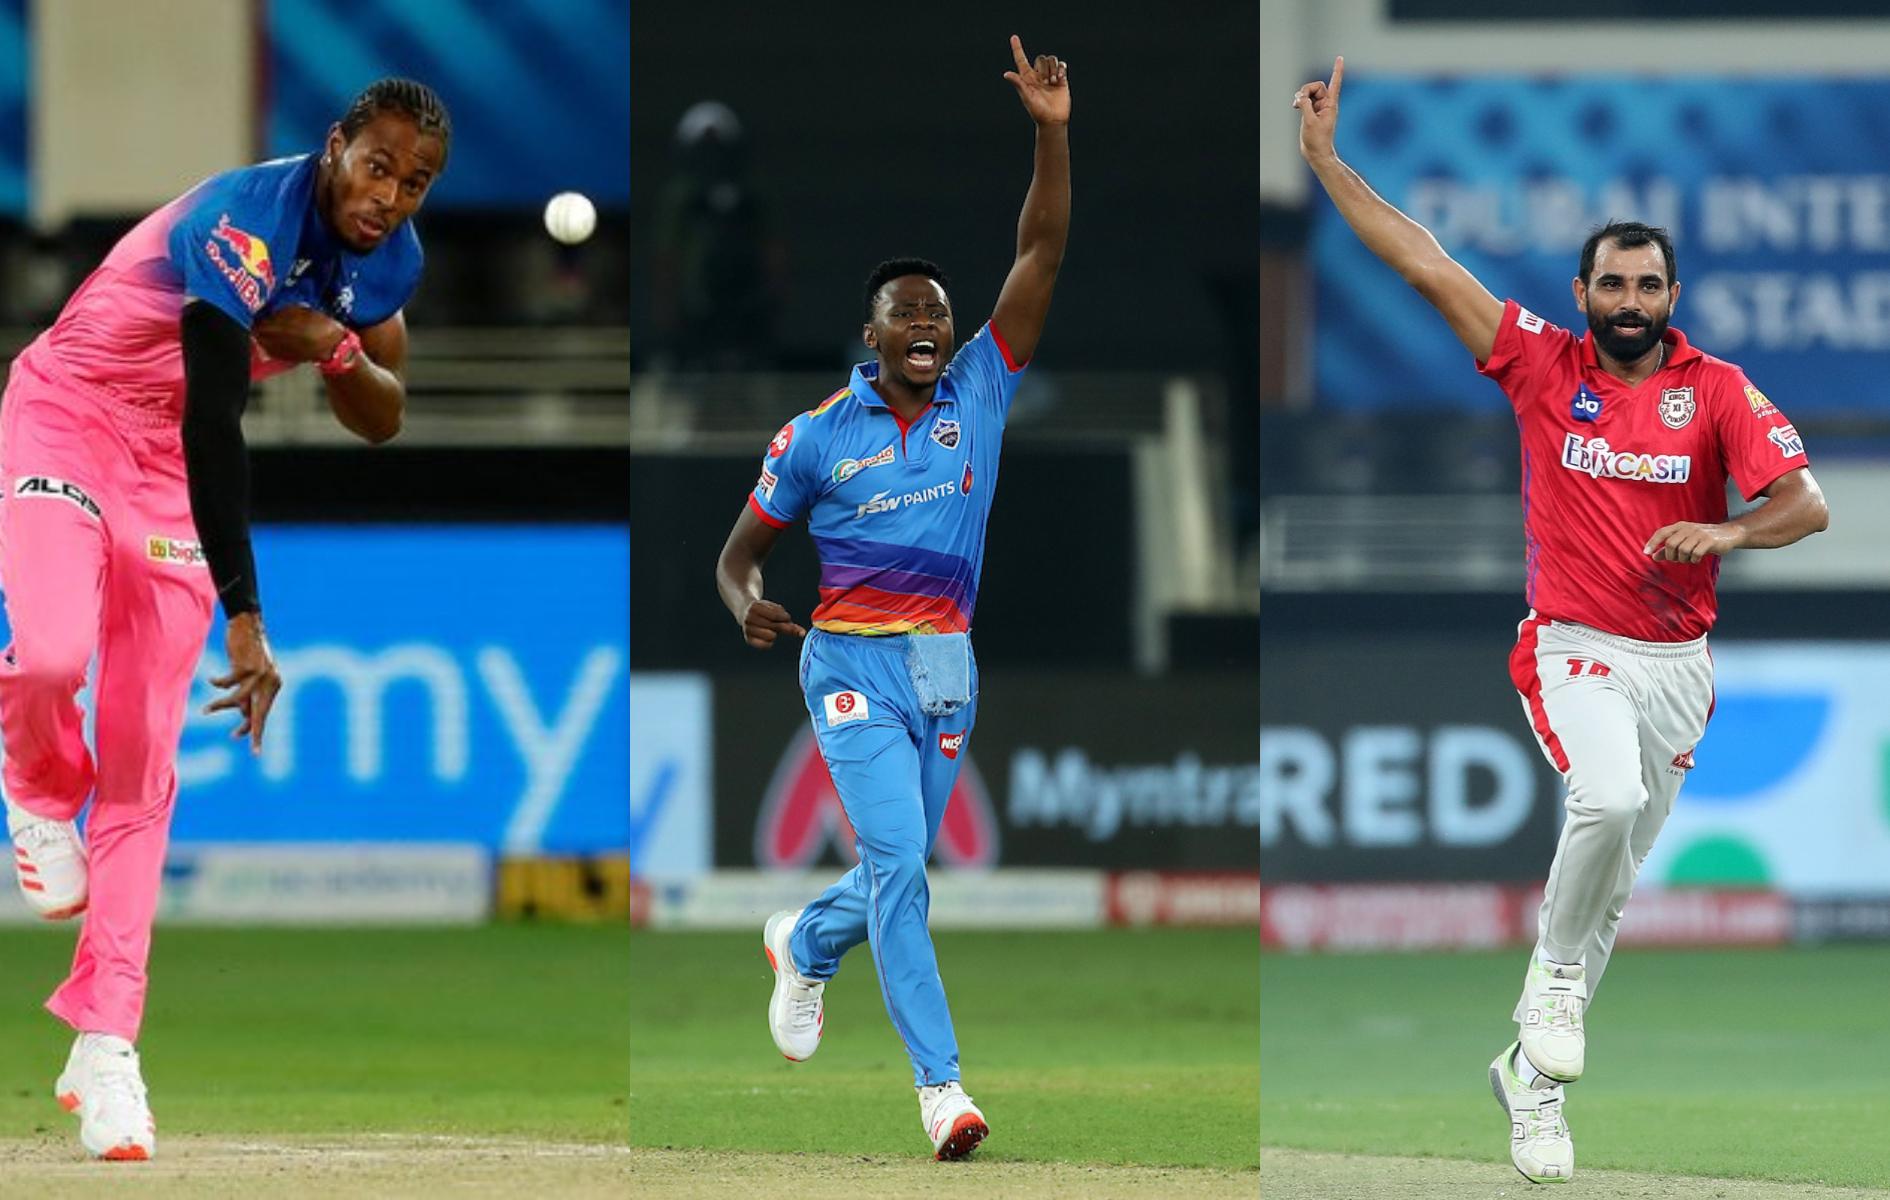 Jofra Archer, Kagiso Rabada and Mohammad Shami | BCCI/IPL